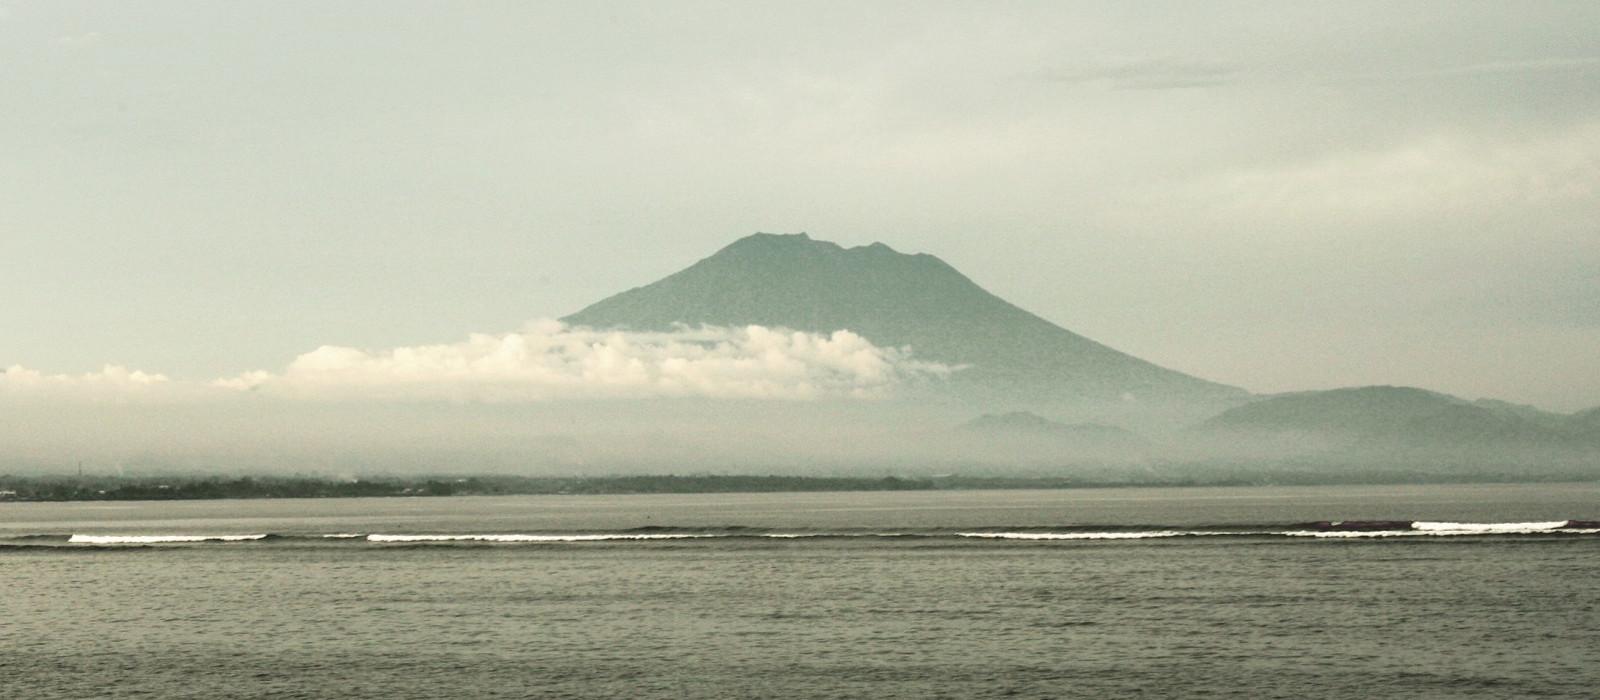 Reiseziel Bali, Denpasar Indonesien